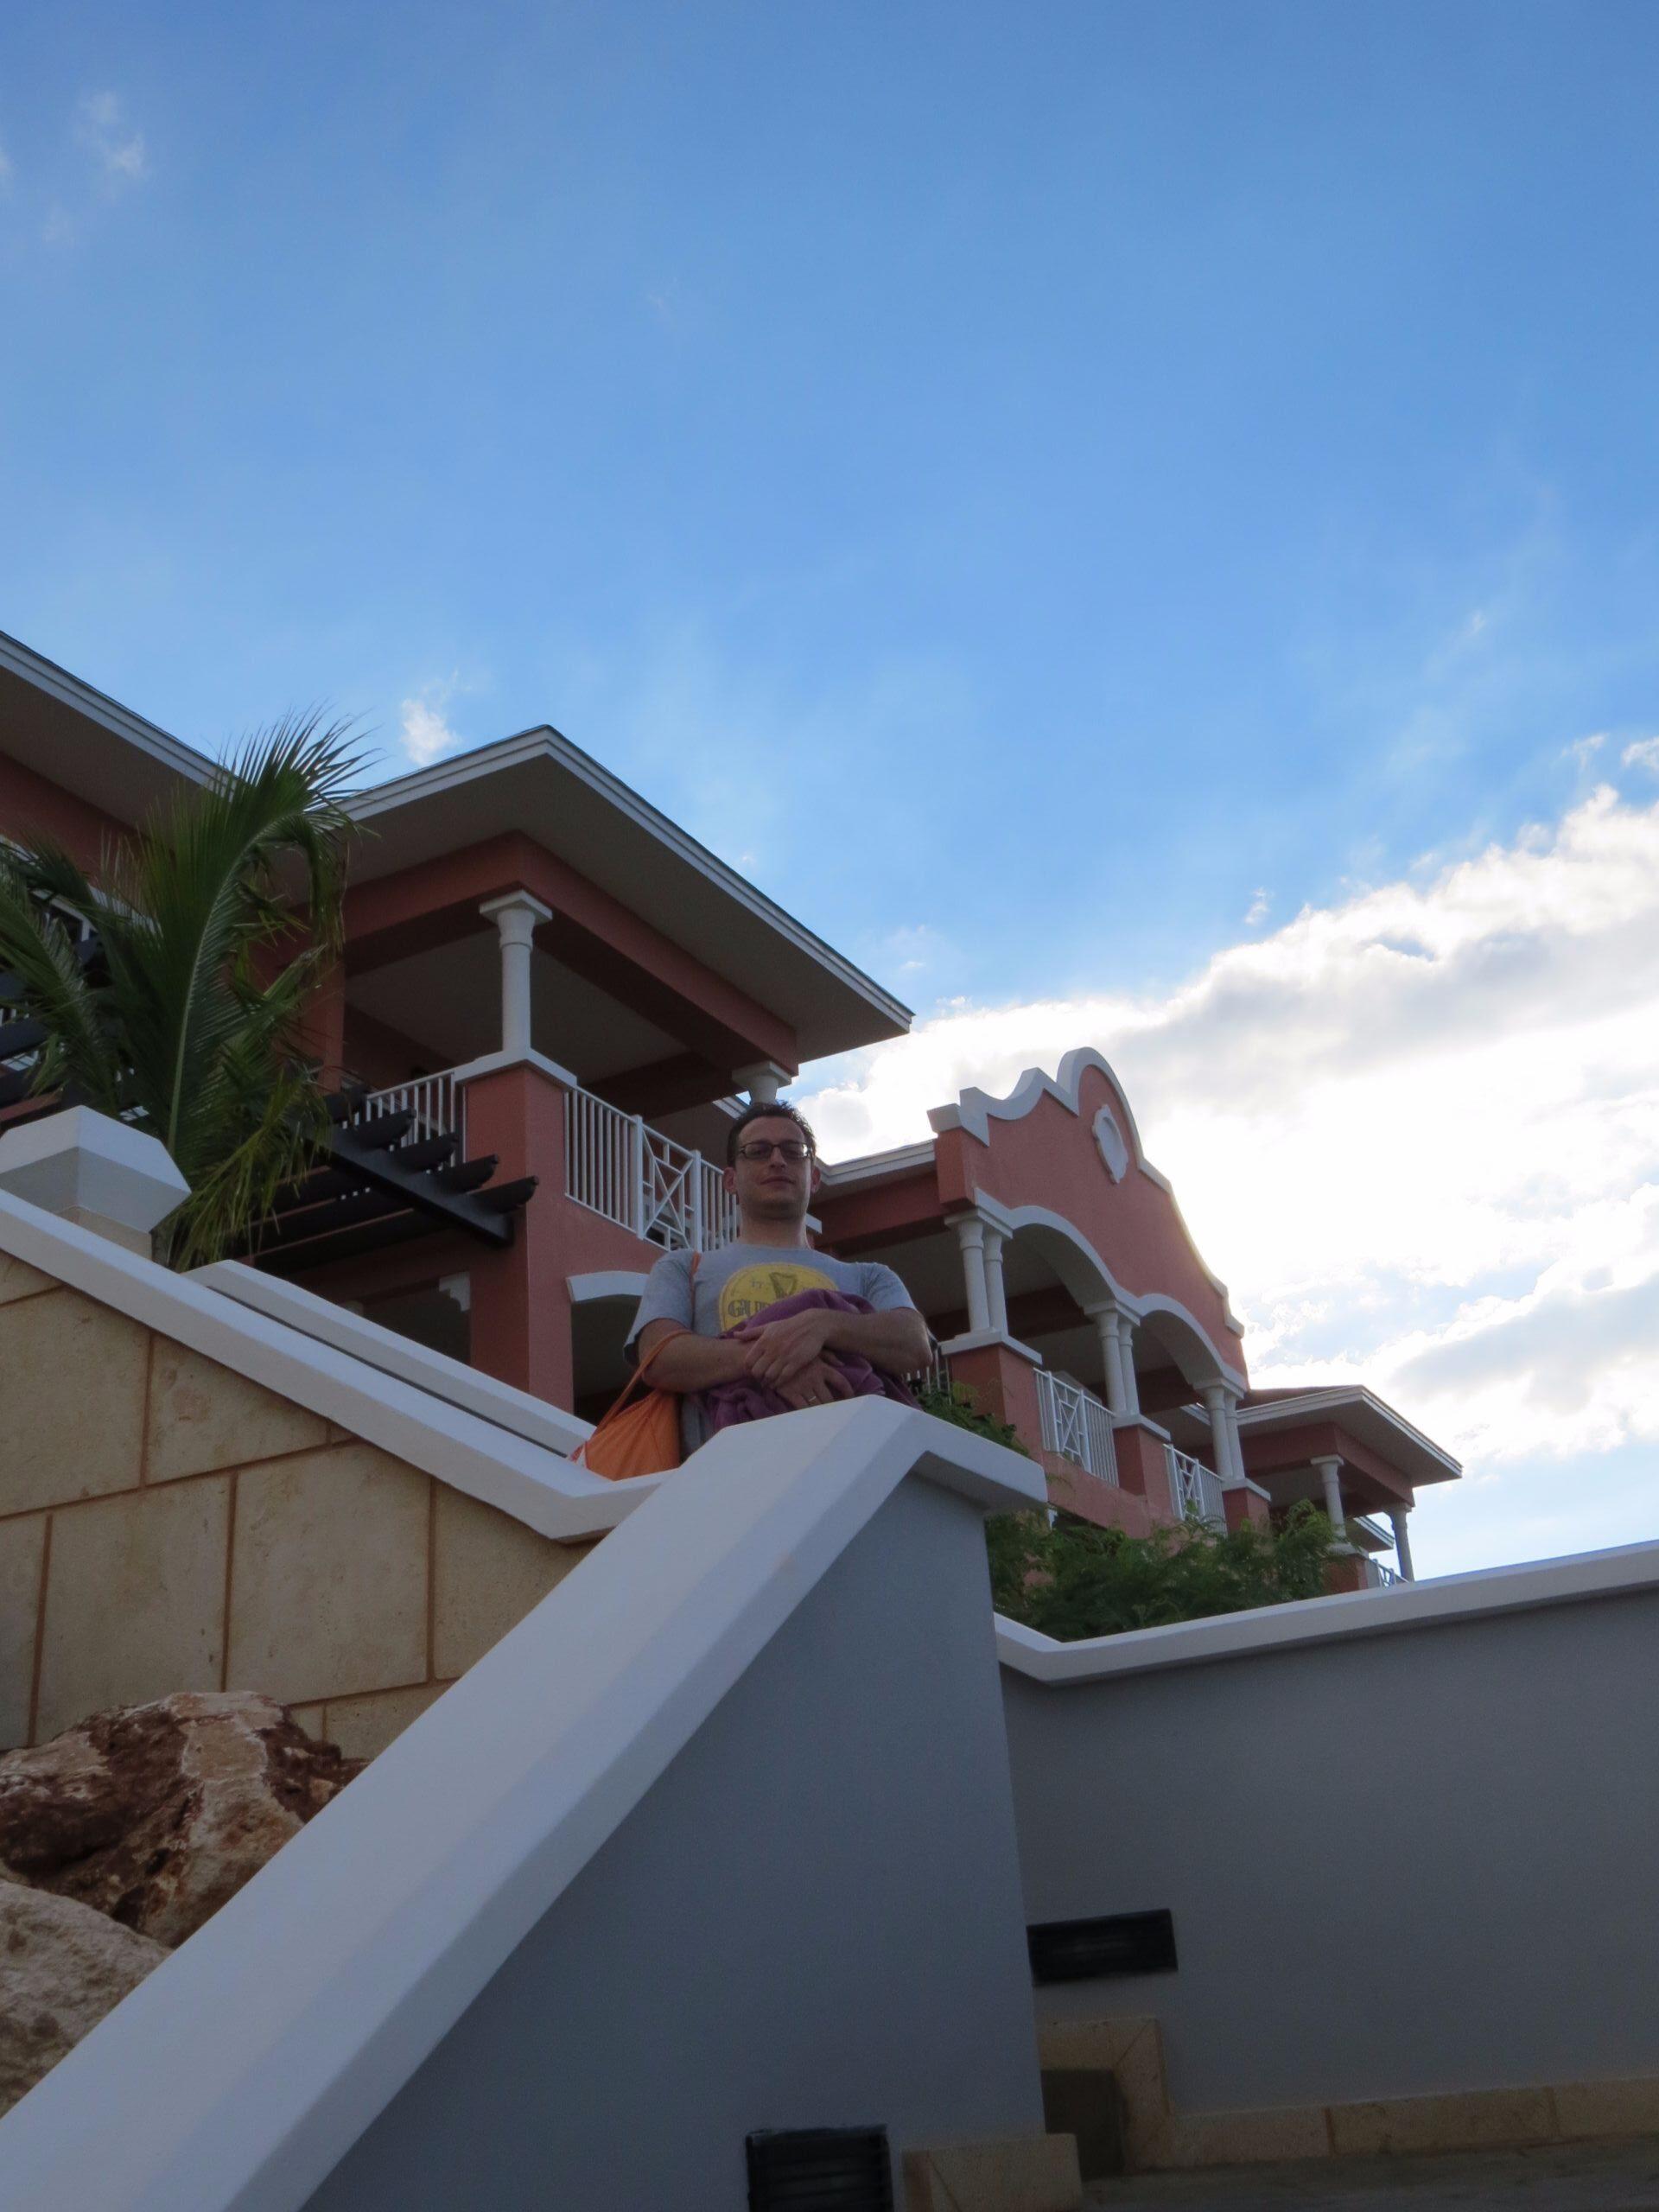 Отзыв огостинице Парадизуз Принцесса дель мар 5*, Варадеро